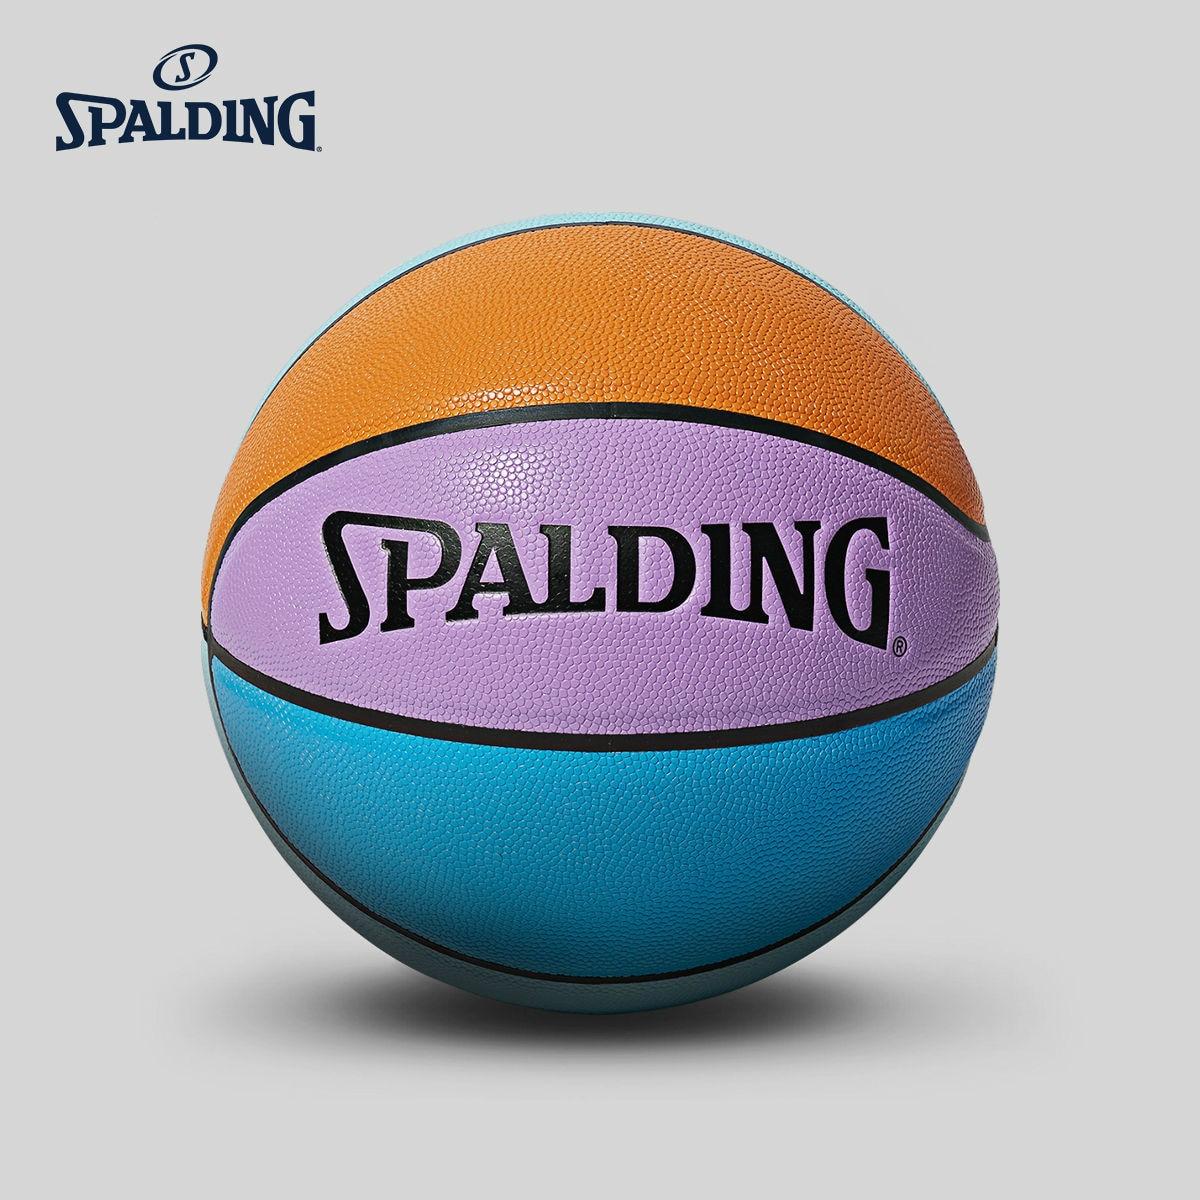 SPALDING Standard Rainbow multicolor Basketball PU No. 7 Men Basketbol Ball 76-706Y Baloncesto basketball